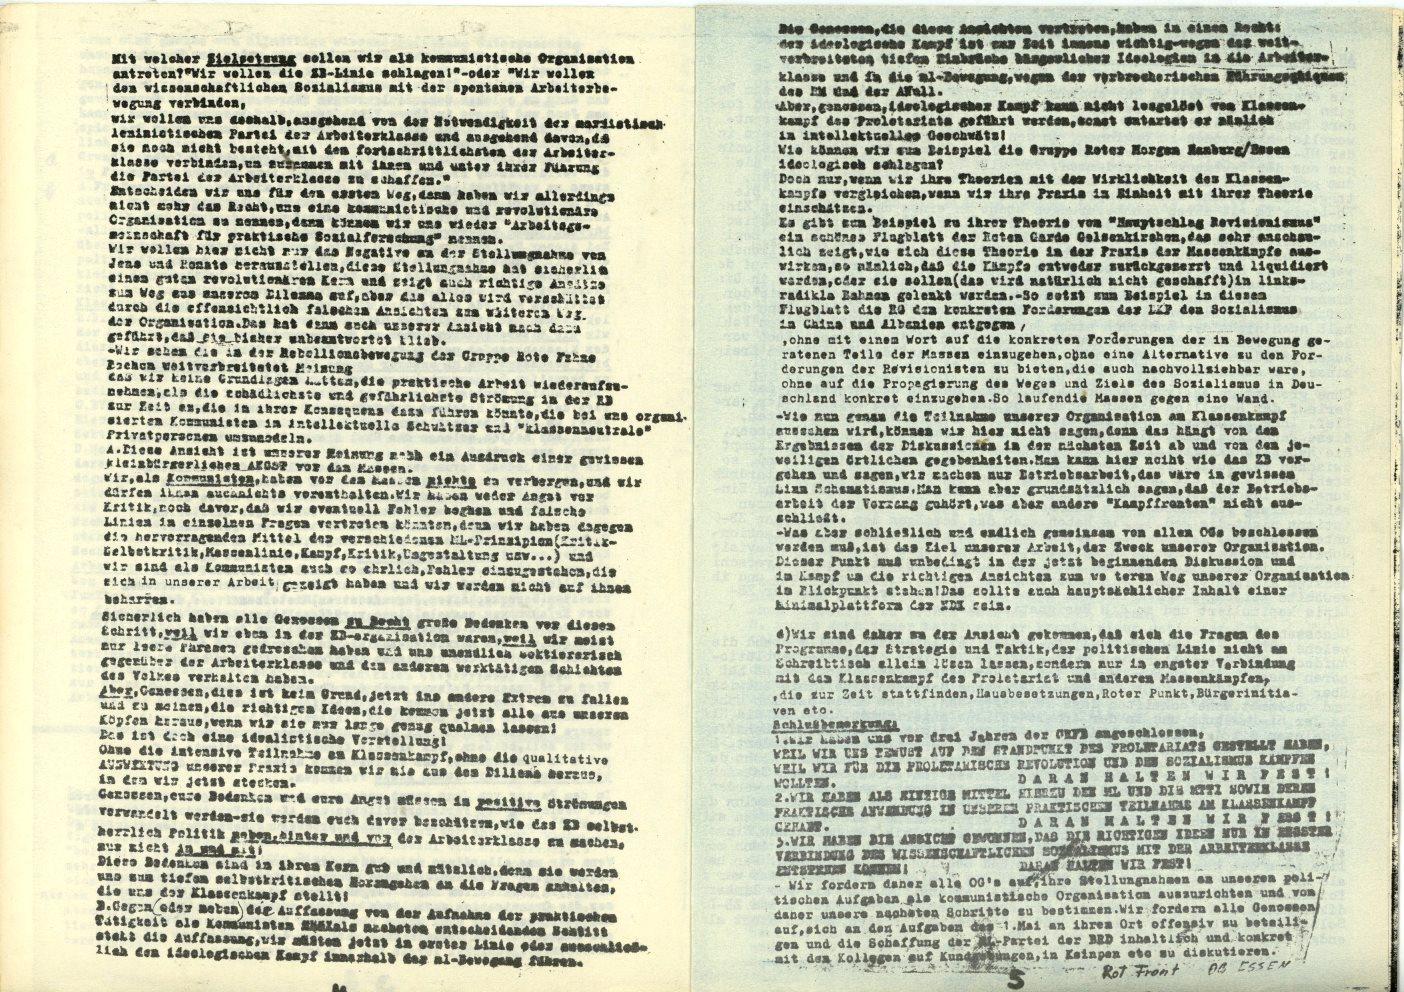 ZB_Rebellionsbewegung_Diskussionsorgan_19730419_04